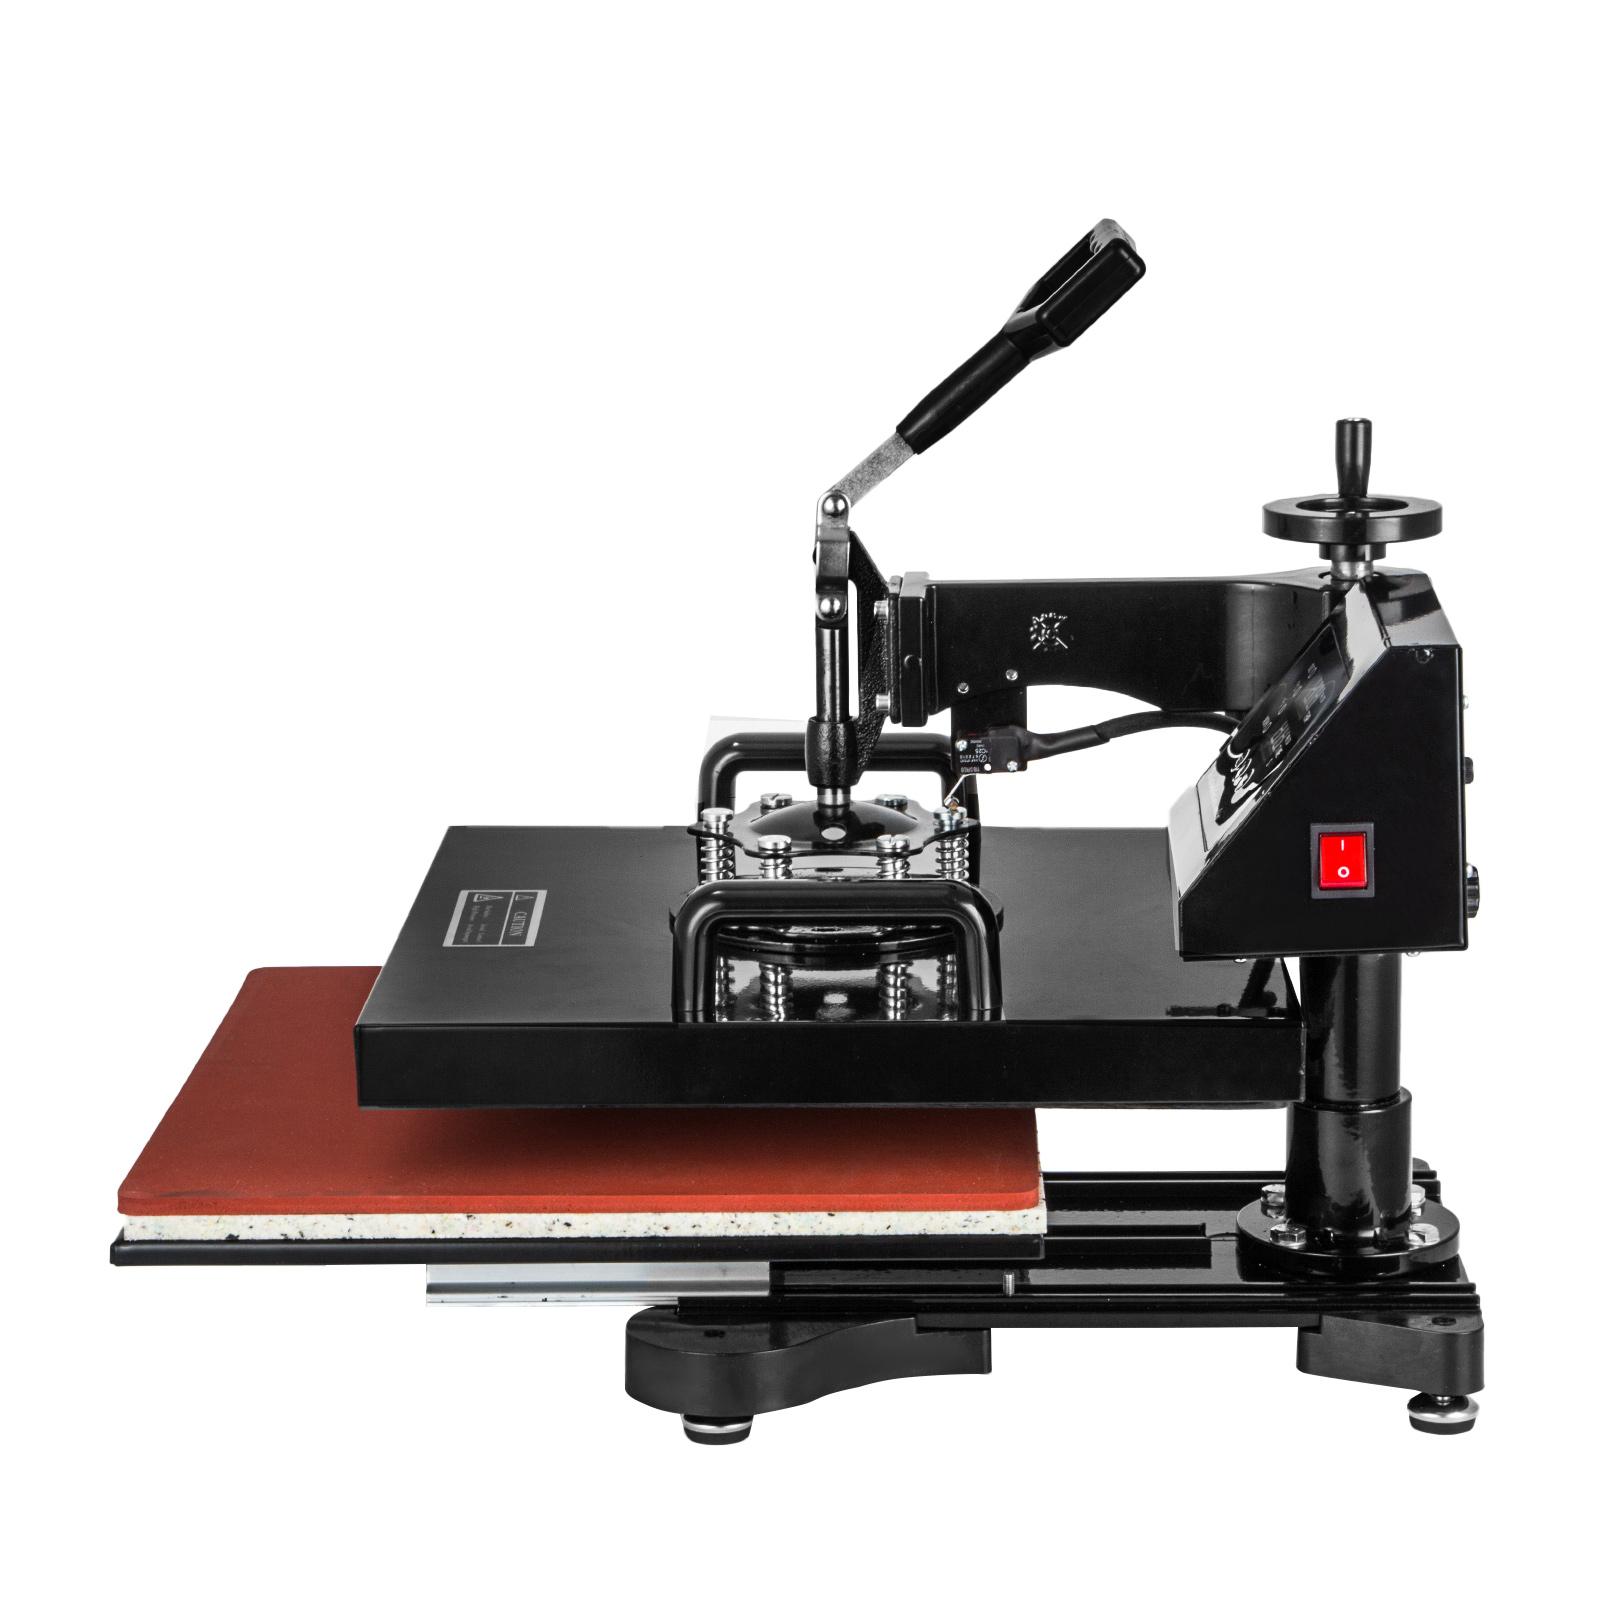 presse textile 5in1 presse chaud taille 38 x 38 cm neuf impression textile ebay. Black Bedroom Furniture Sets. Home Design Ideas